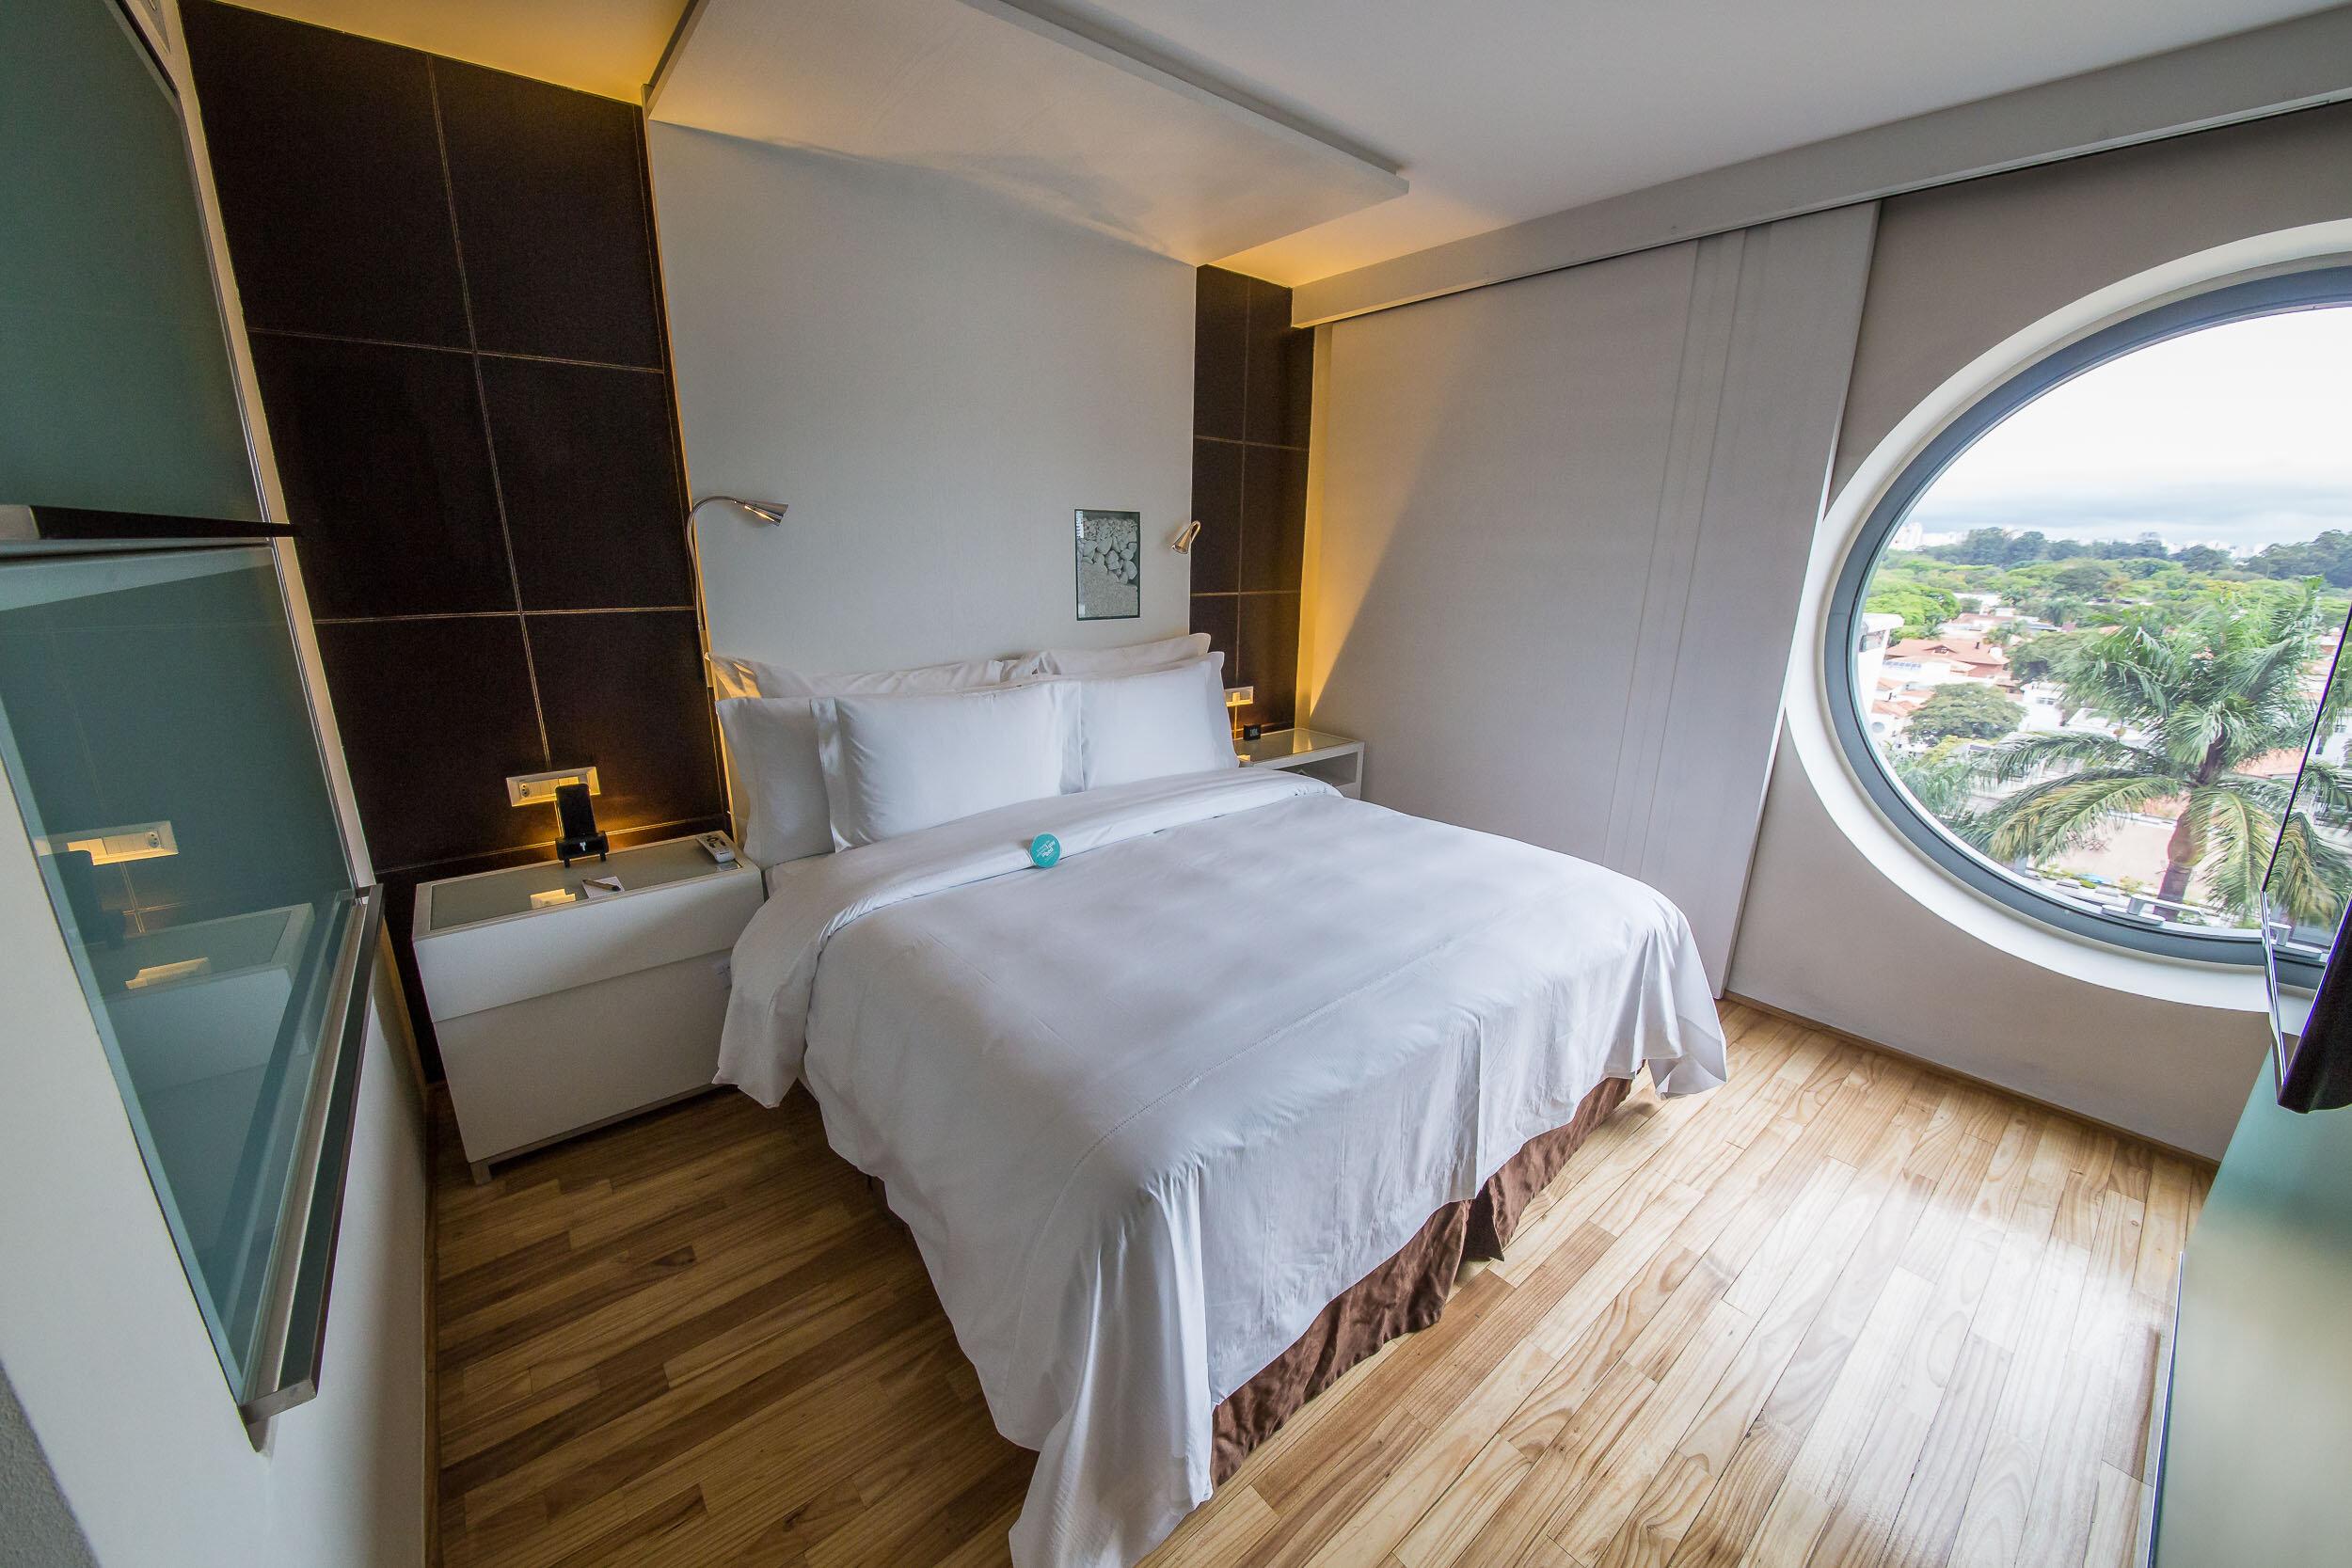 Bedroom, Deluxe Room, Hotel Unique, Sao Paulo, Brazil